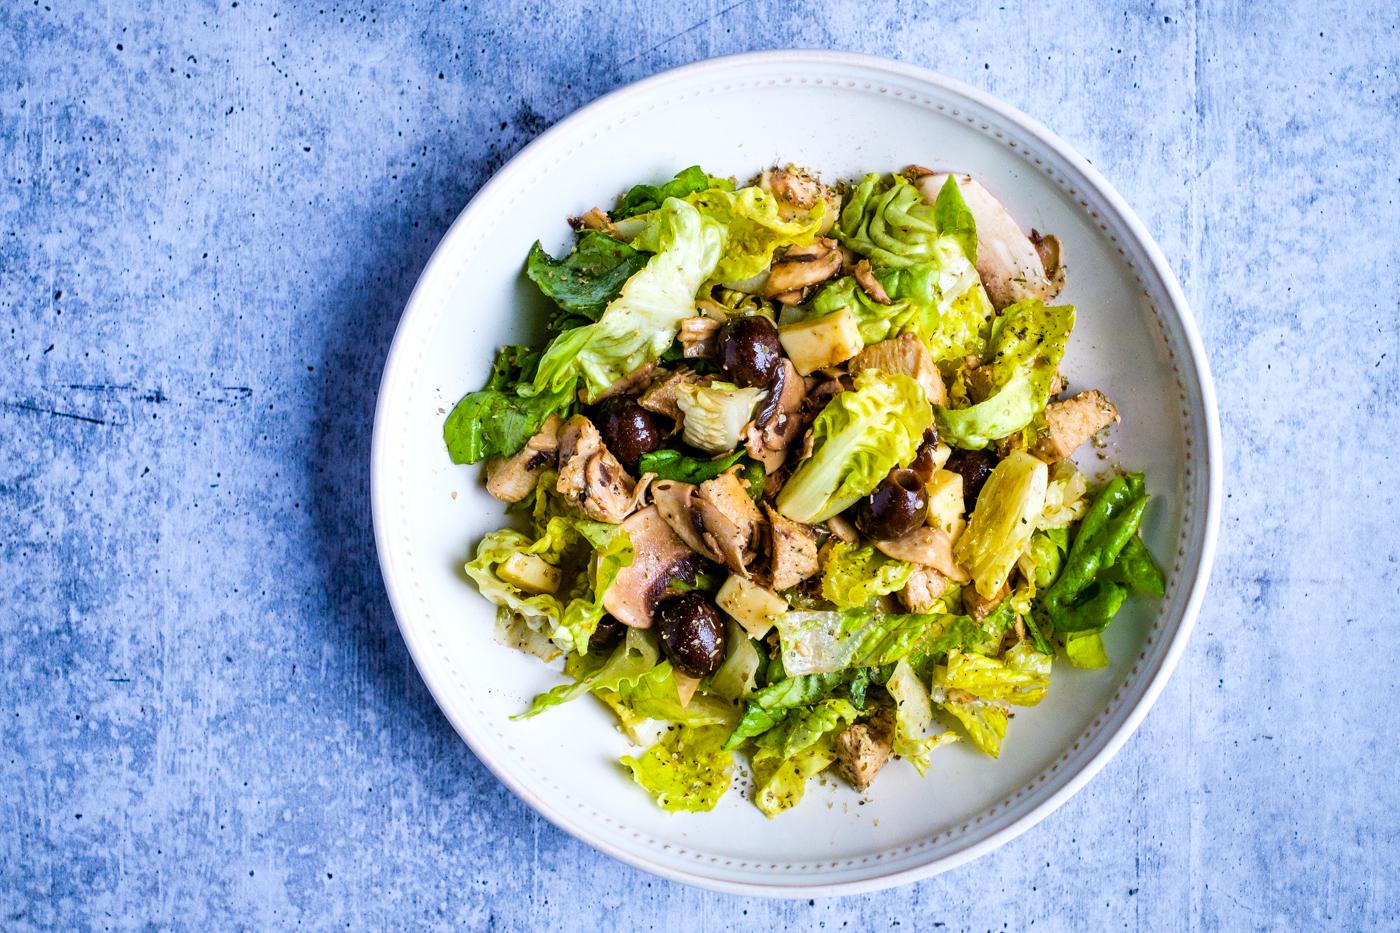 Italian Chicken Salad with Balsamic Vinaigrette